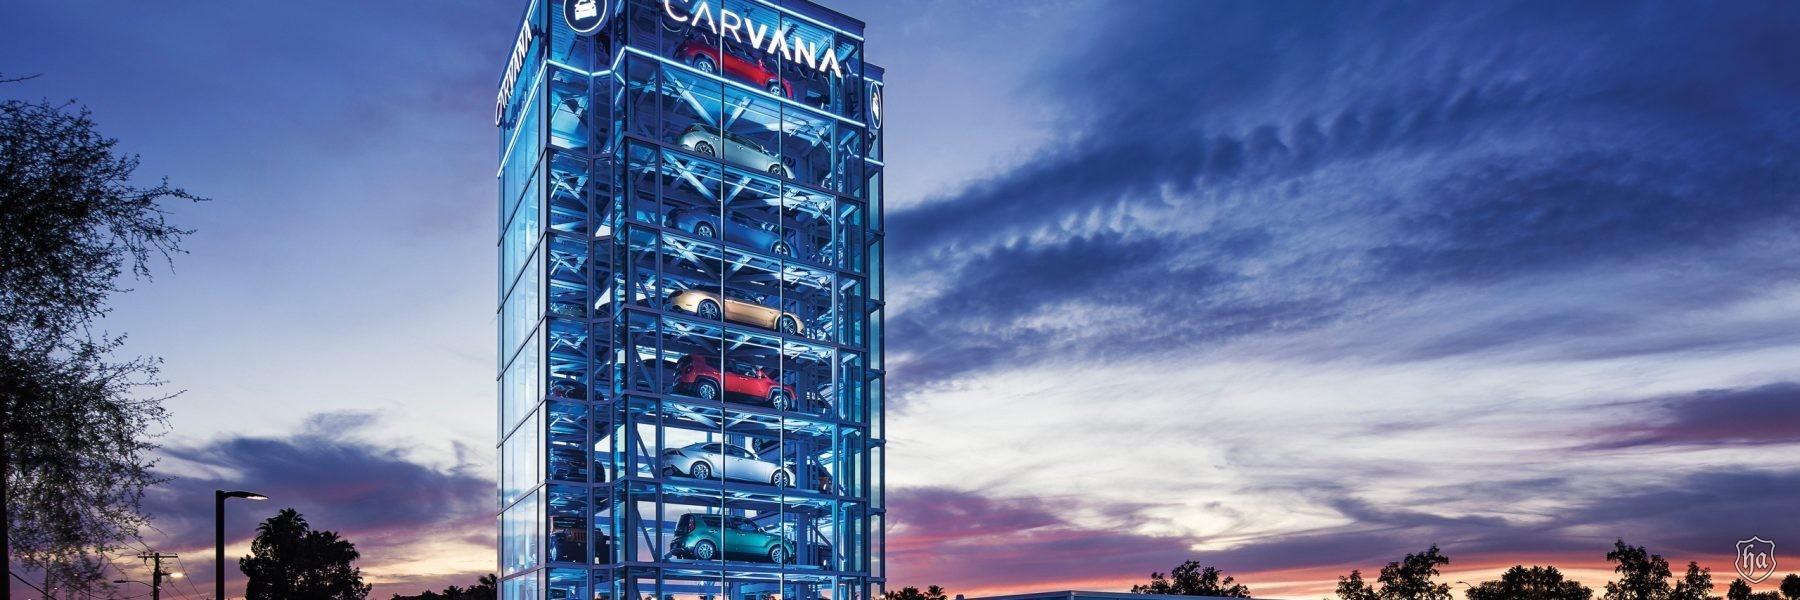 Covington Honda Nissan >> Altered Carbon Online Car Sales Company Carvana Opens ...